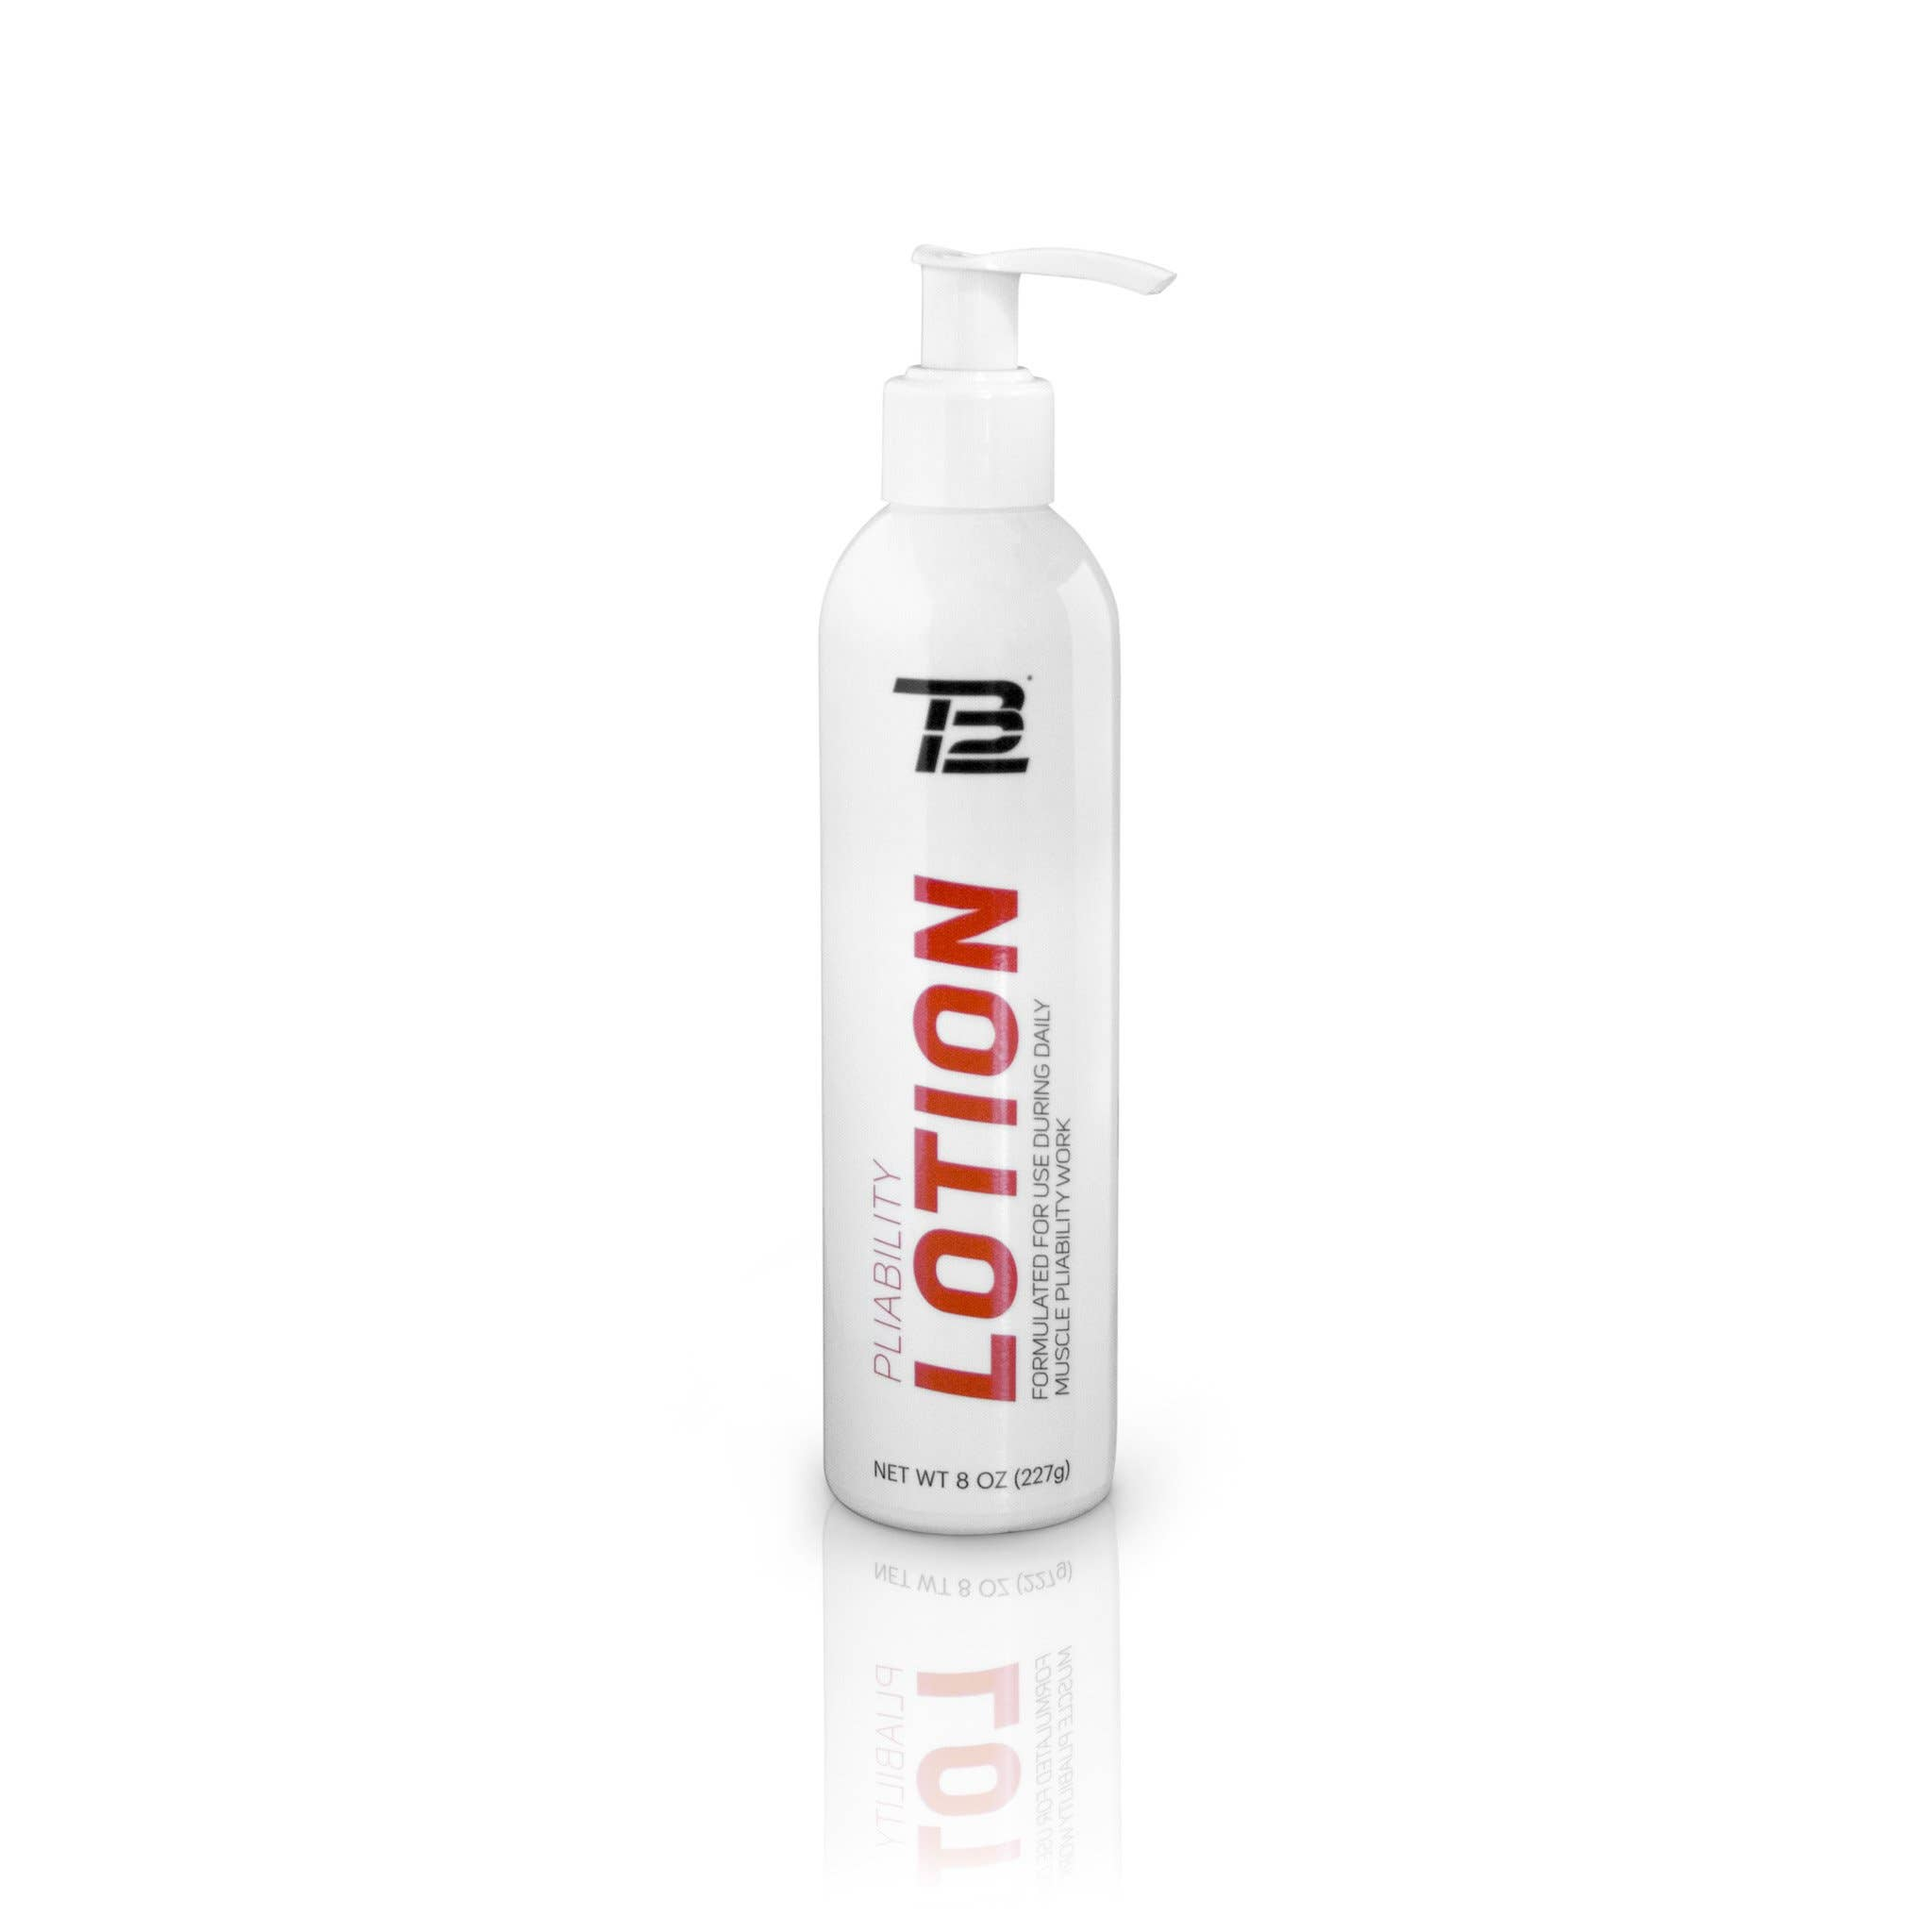 TB12™ Pliability Lotion